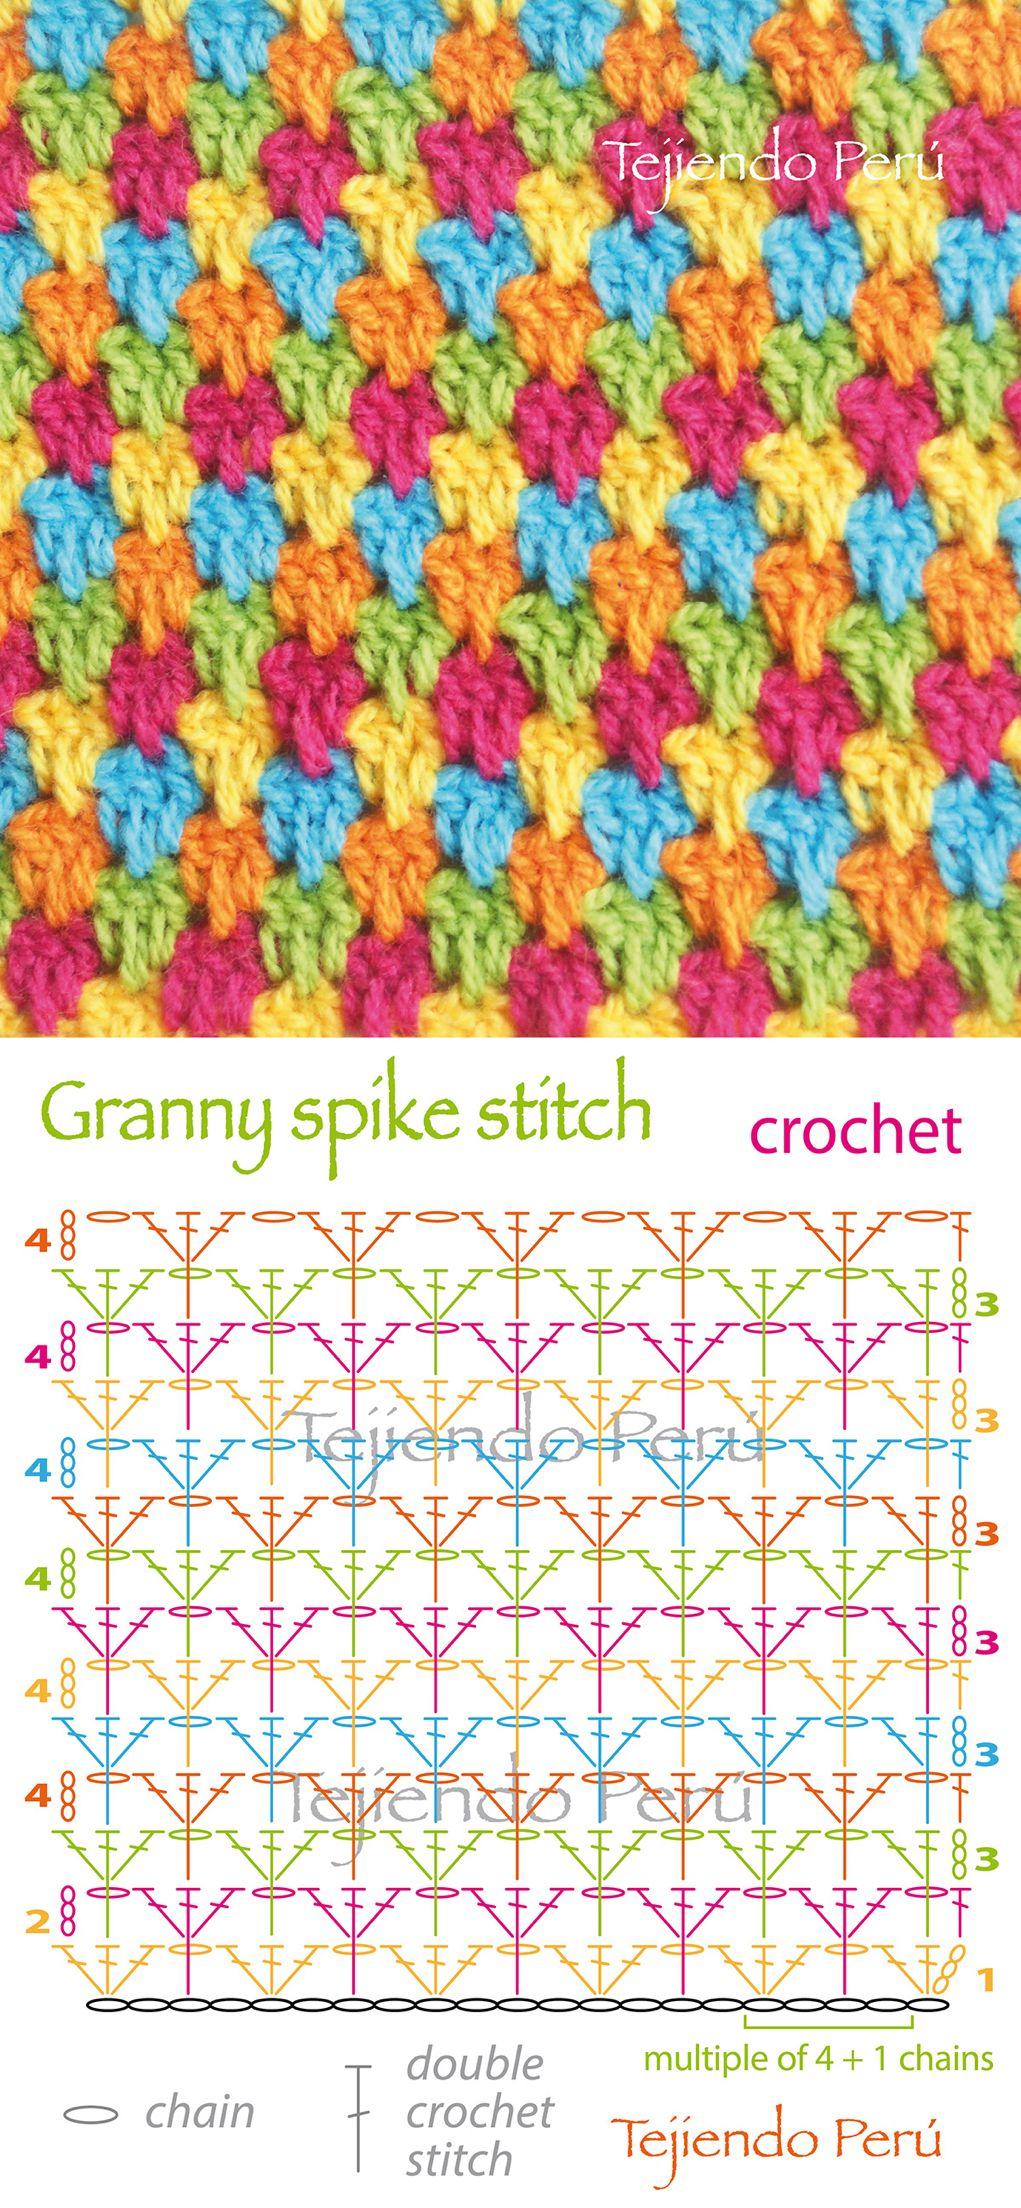 Crochet Granny Spike Stitch Diagram Puntos Fantasía En Crochet